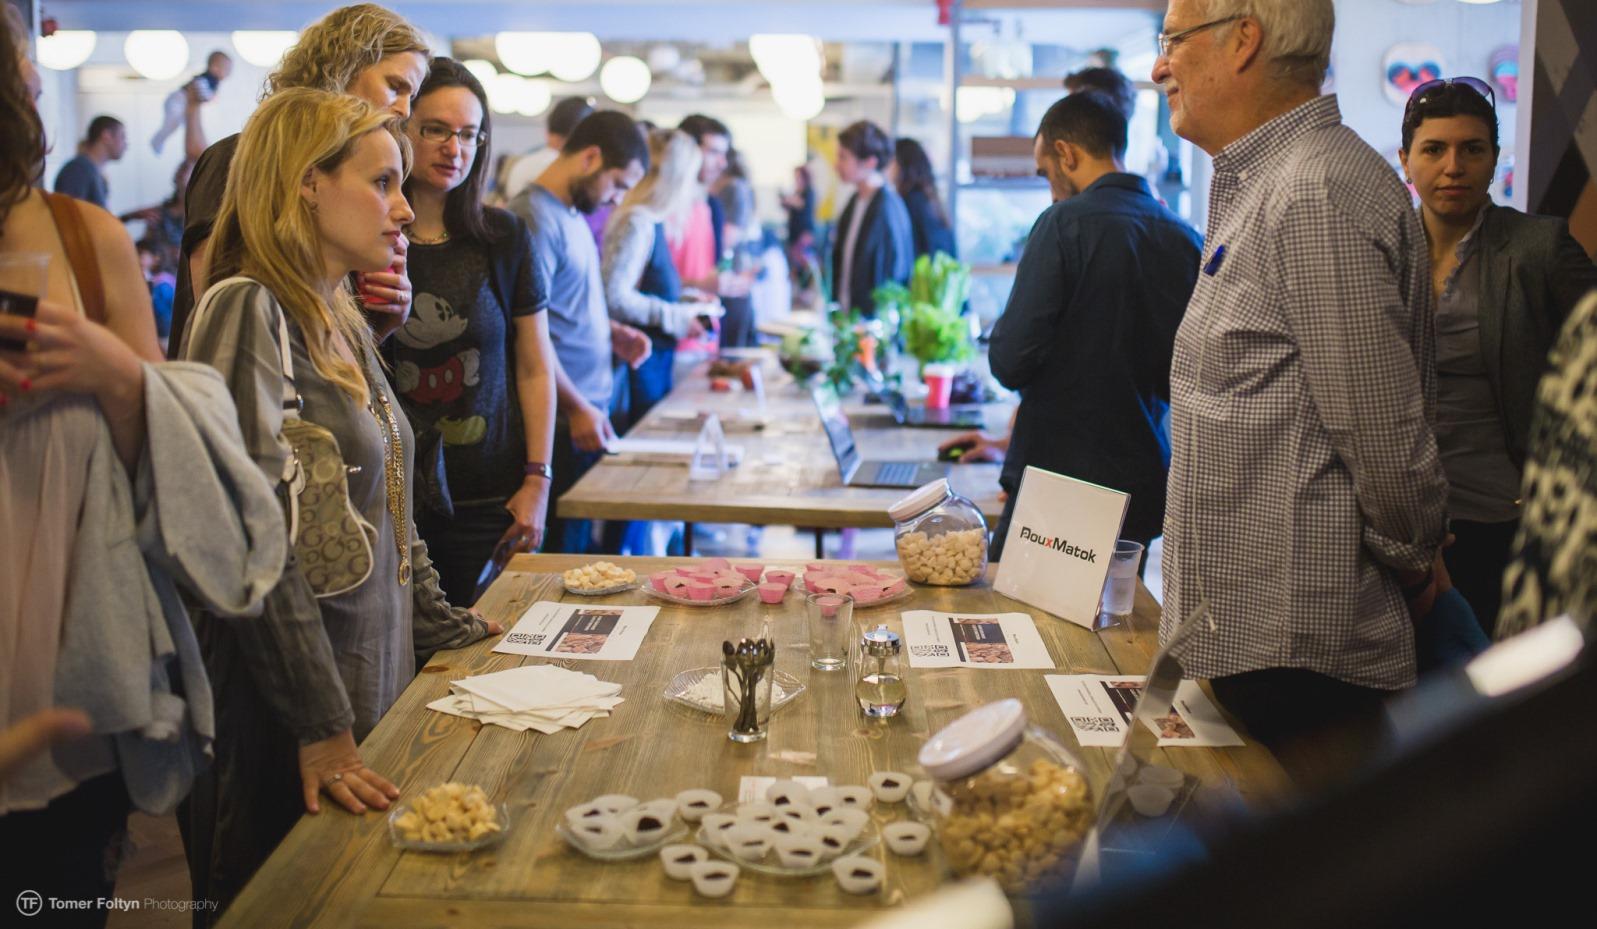 Food innovation on display in Jerusalem. Photo by Tomer Foltyn